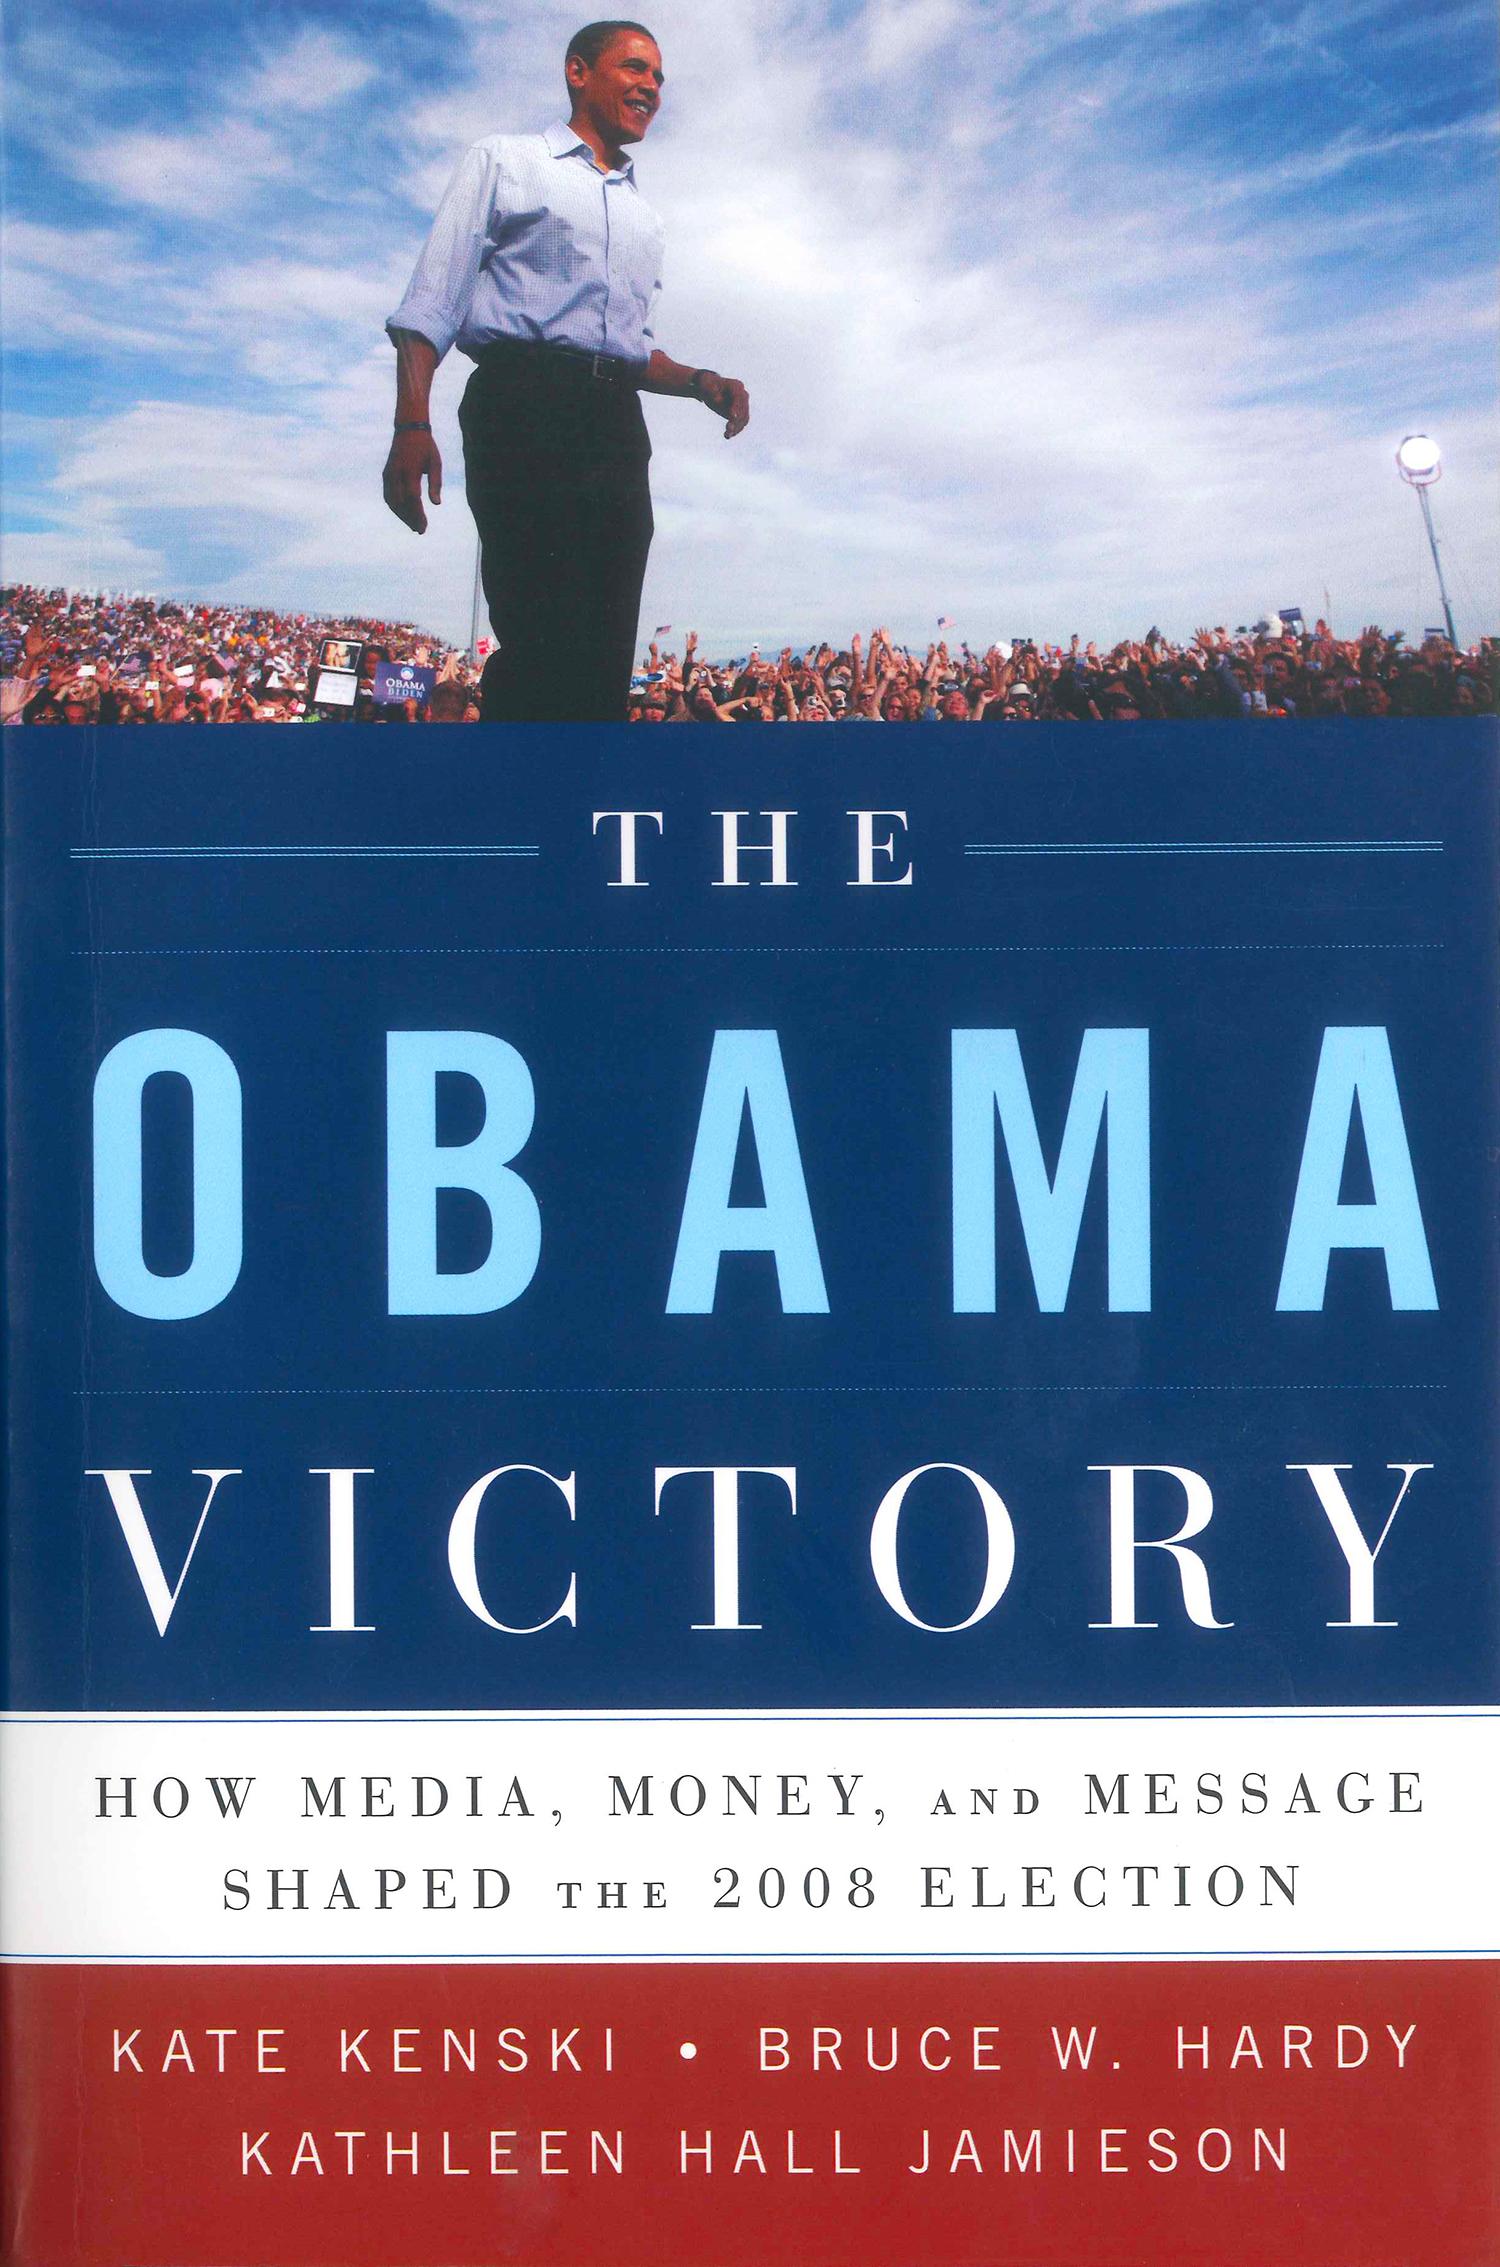 """The Obama Victory"" by Kenski, Hardy, and Jamieson."